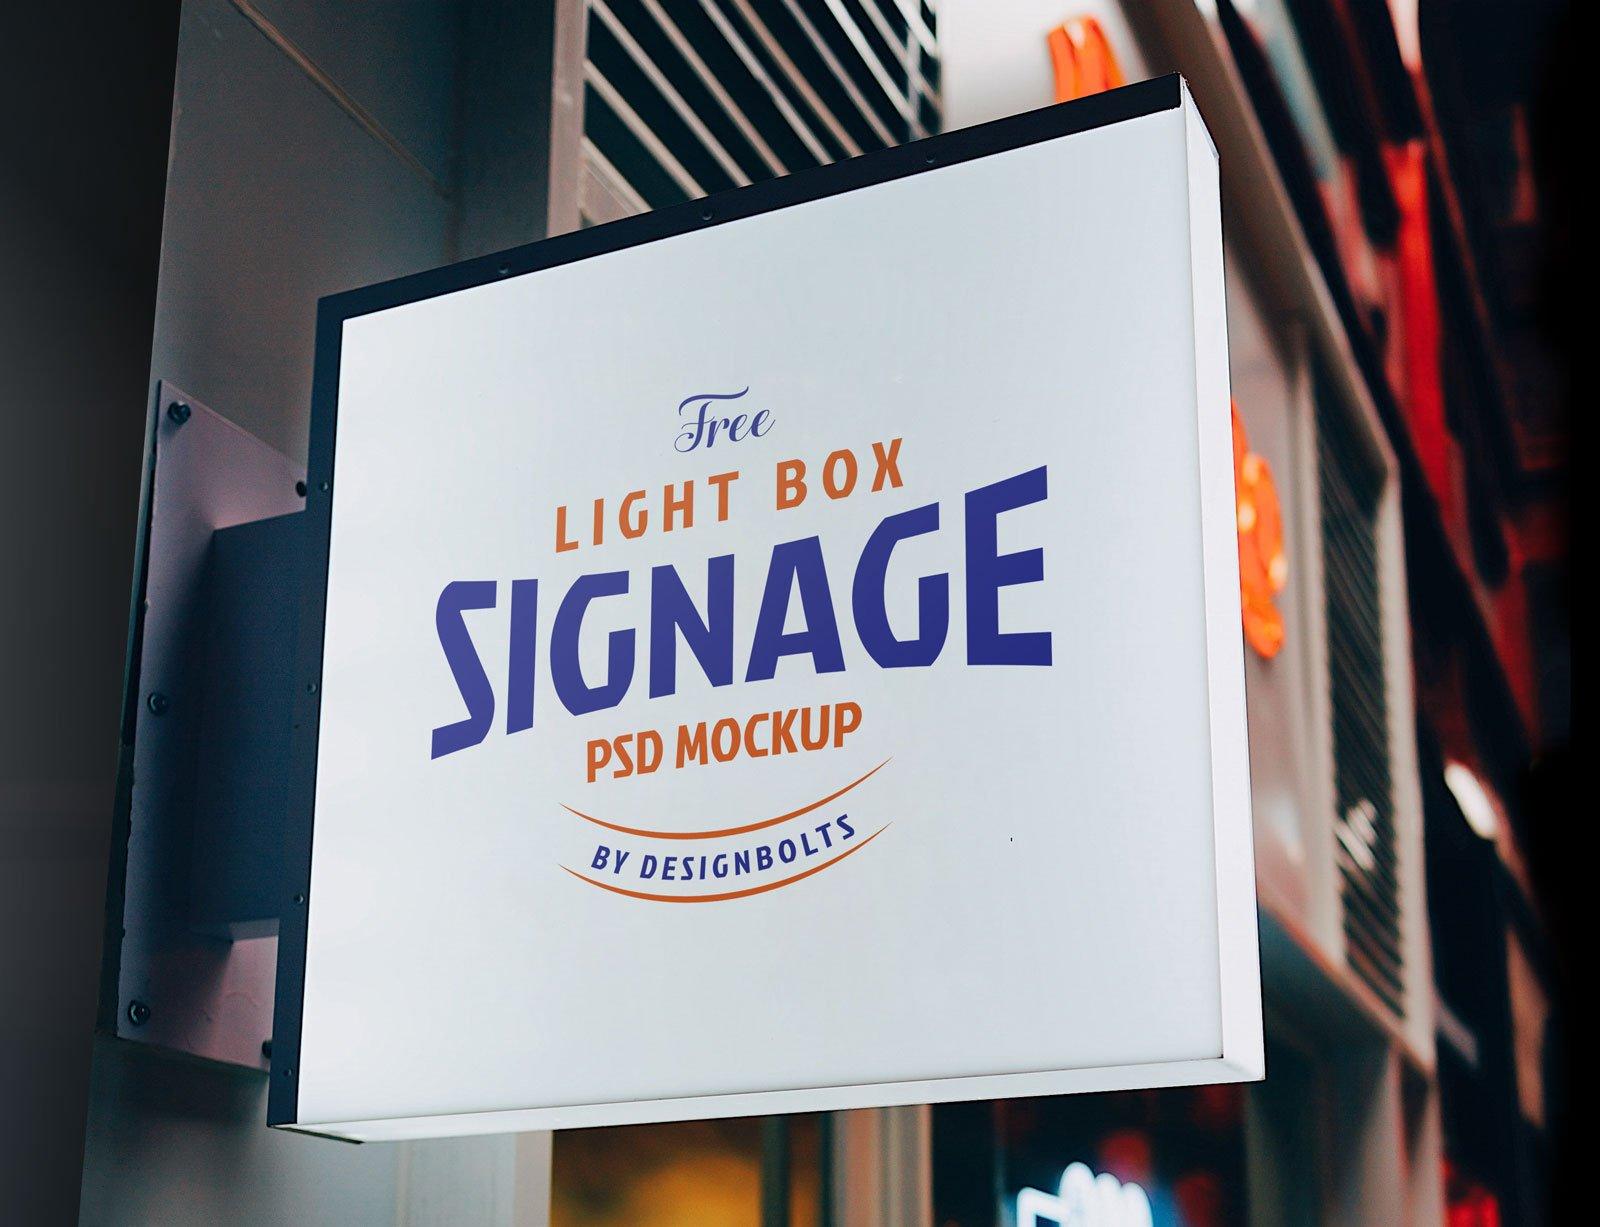 Free Light Box Signage Board Mockup Psd Designbolts